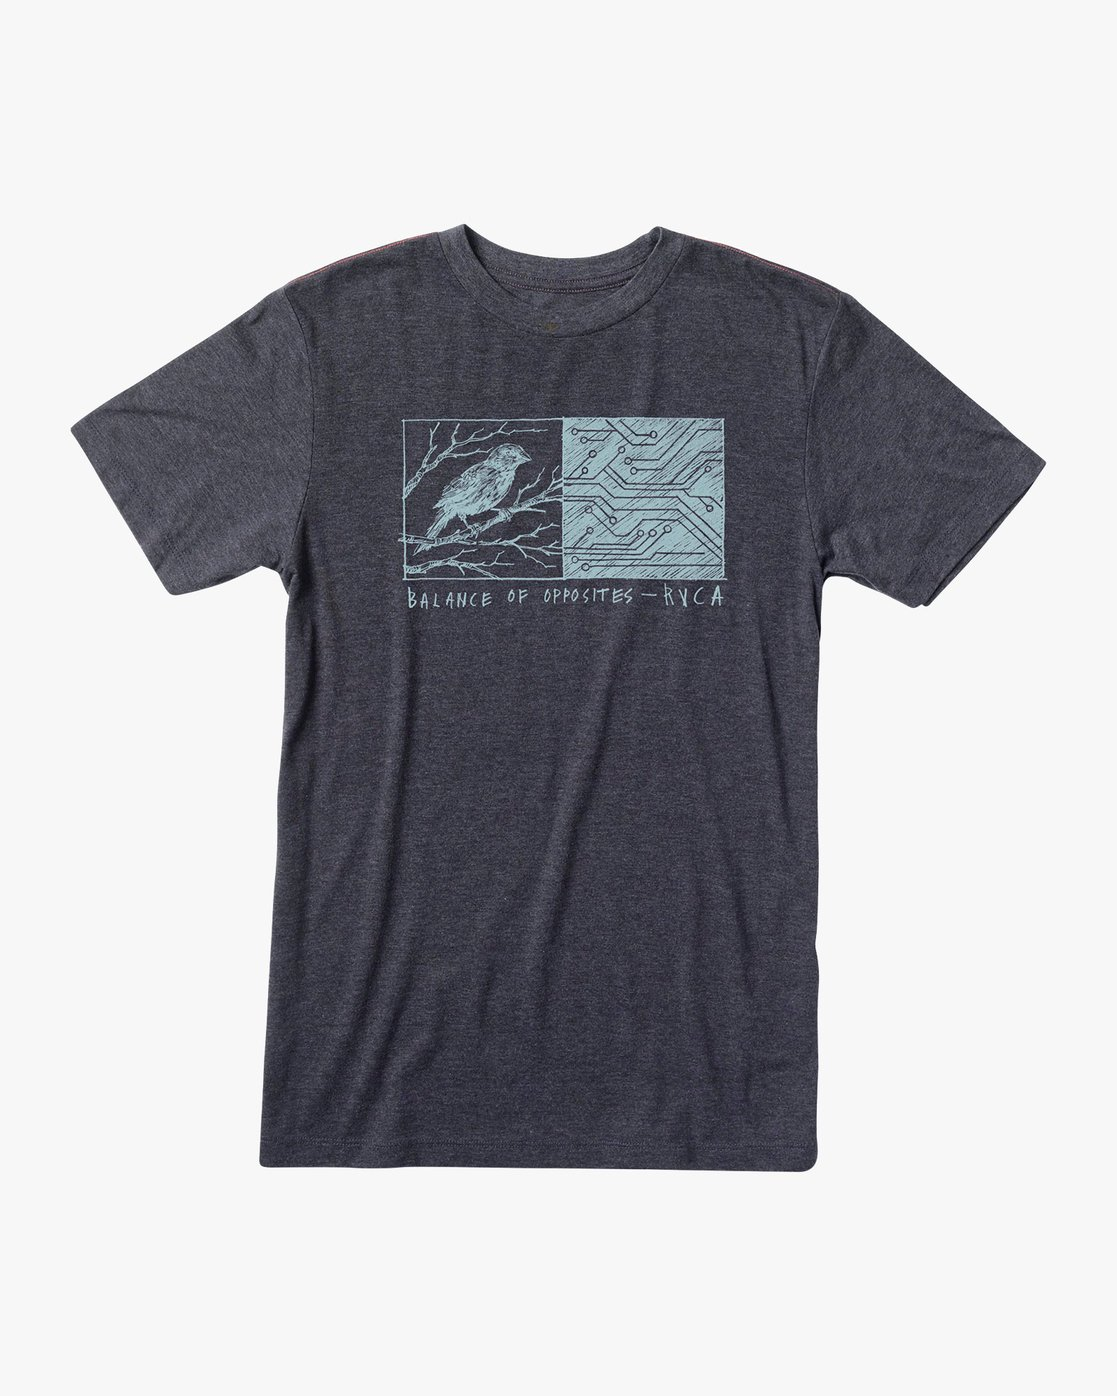 0 Ben Horton Tweet T-Shirt Black M420URTW RVCA